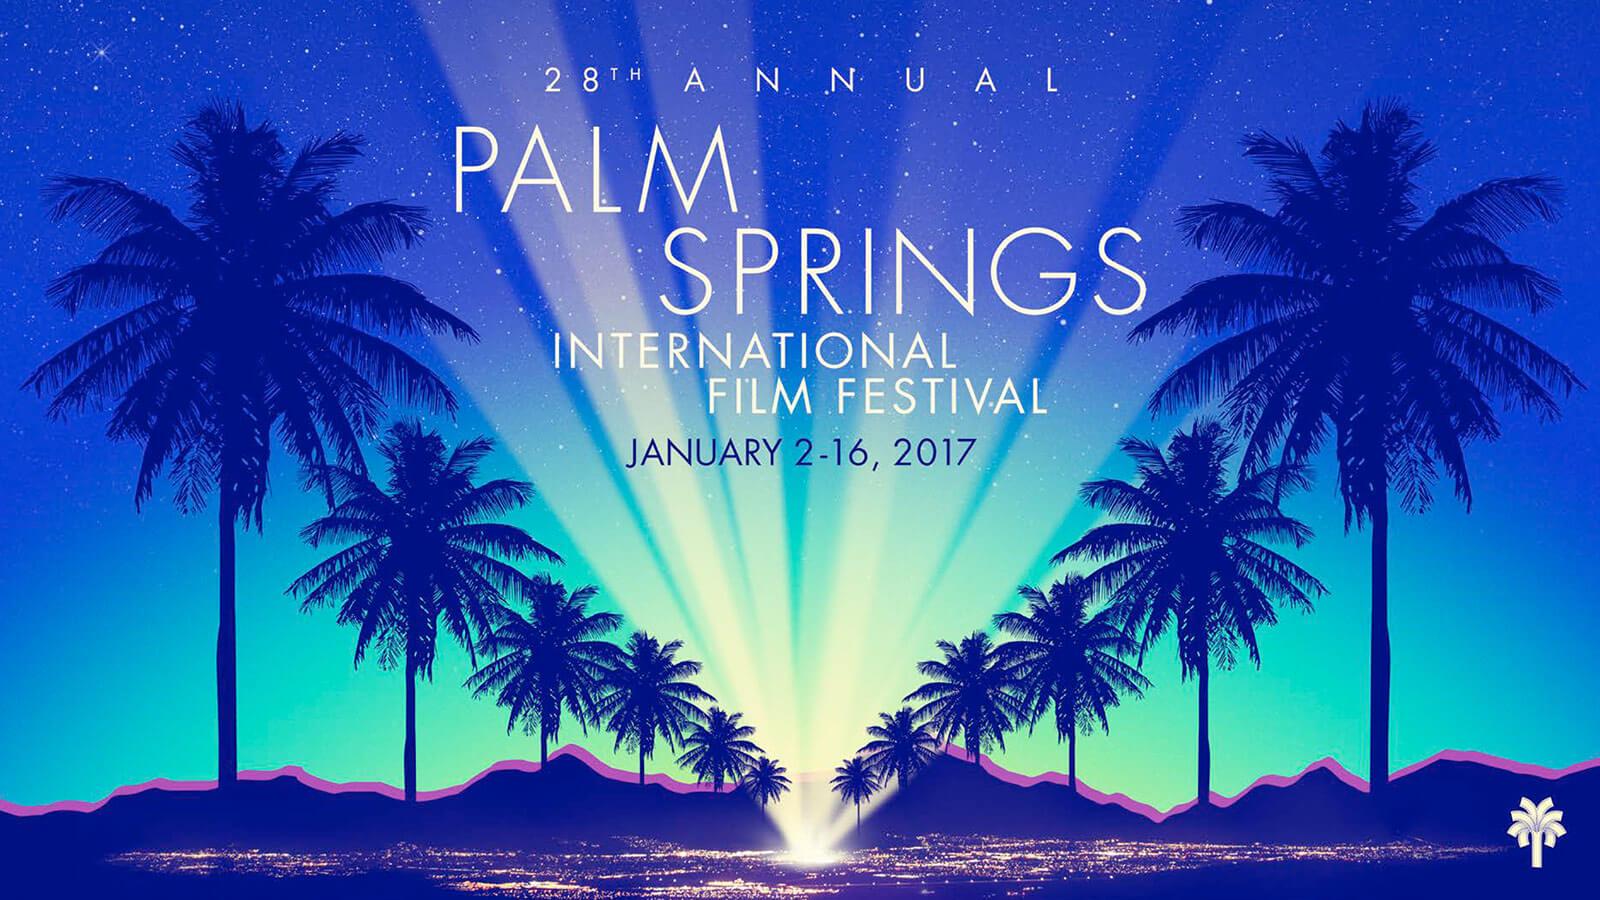 Palm Springs Film Festival 2017 Graphic